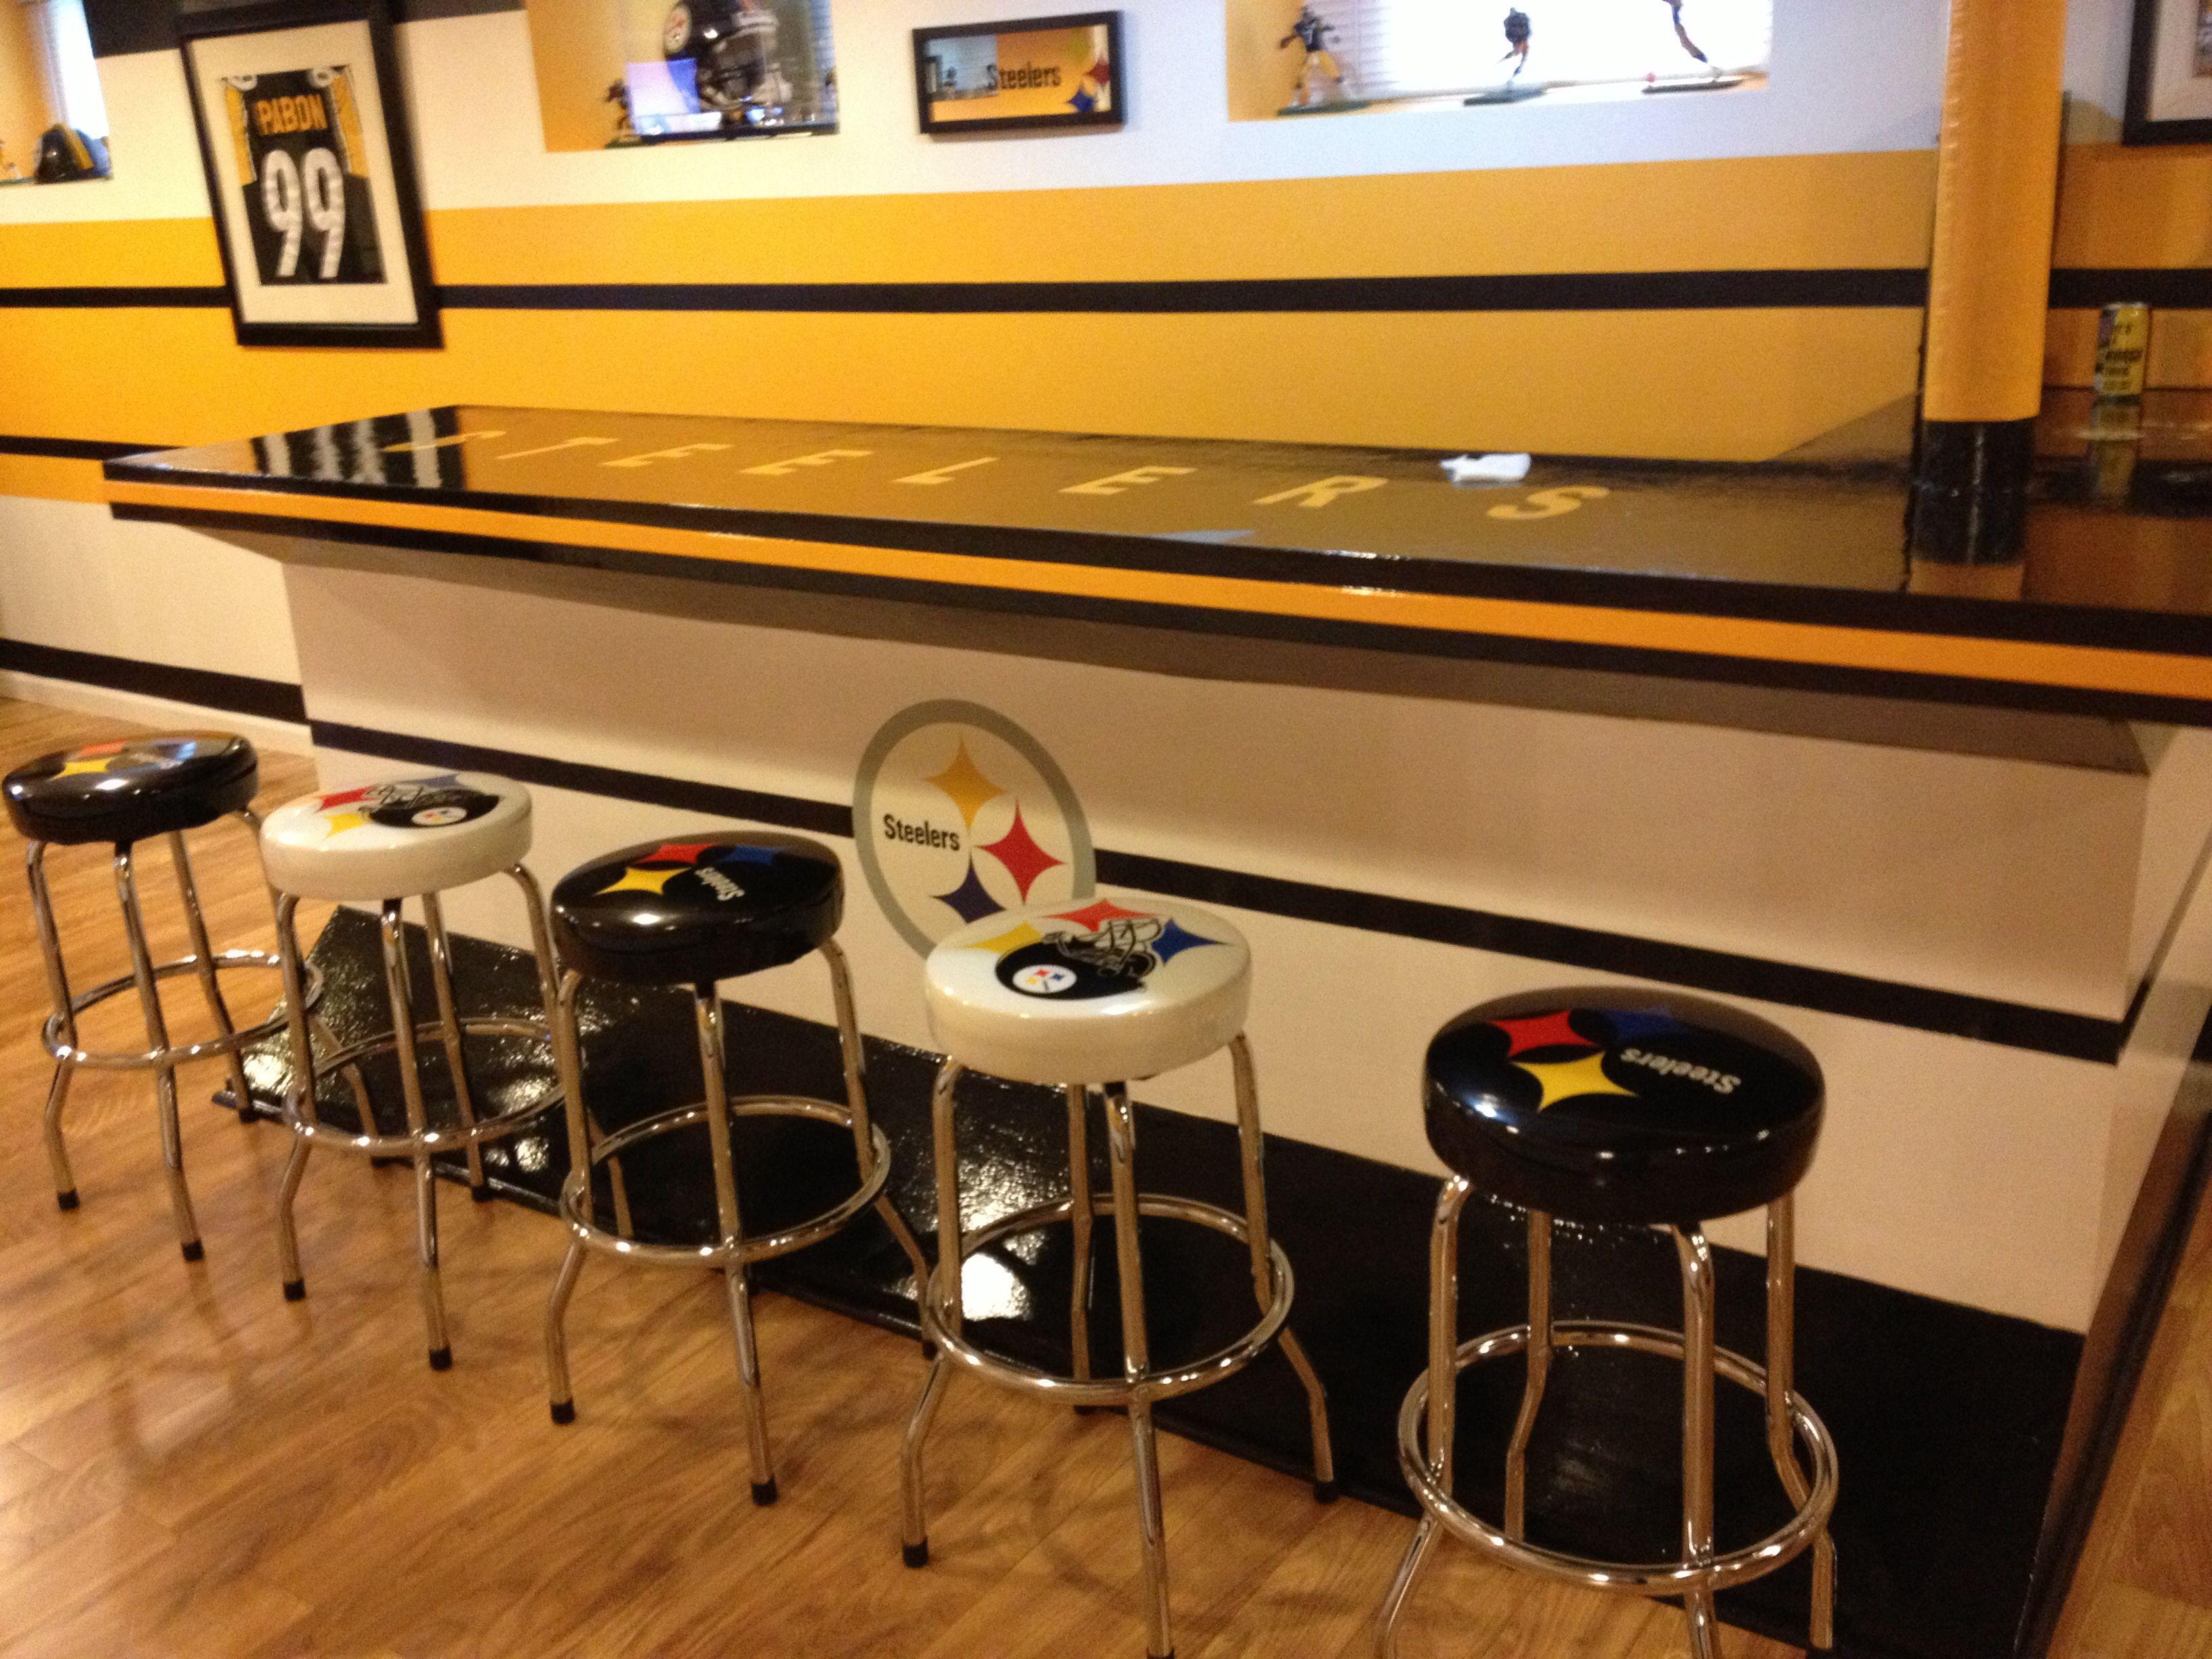 Steelers Bedroom Ideas Our Steelers Man Cave Our Steelers Man Cave